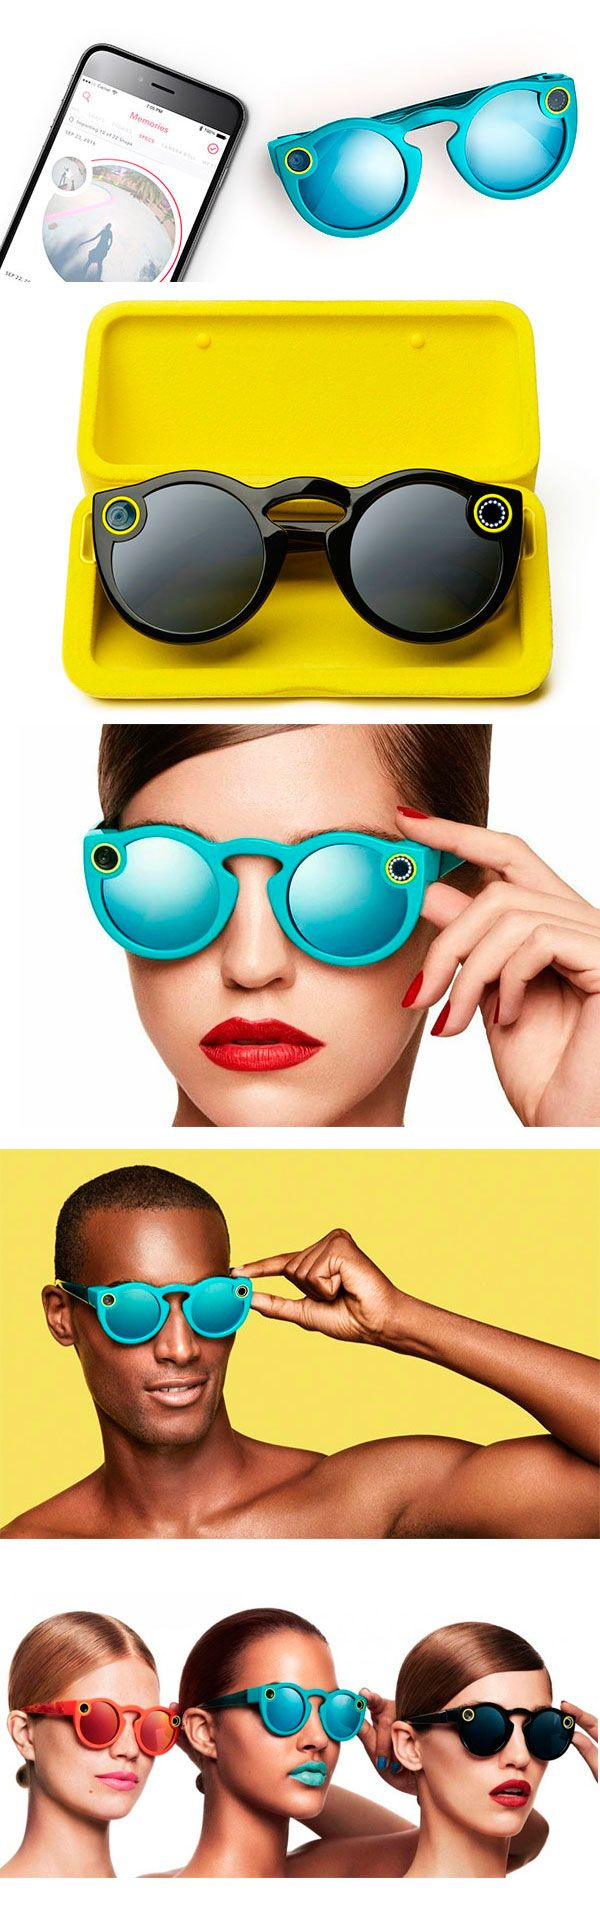 Носимая видеокамера #Snapchat #Spectacles